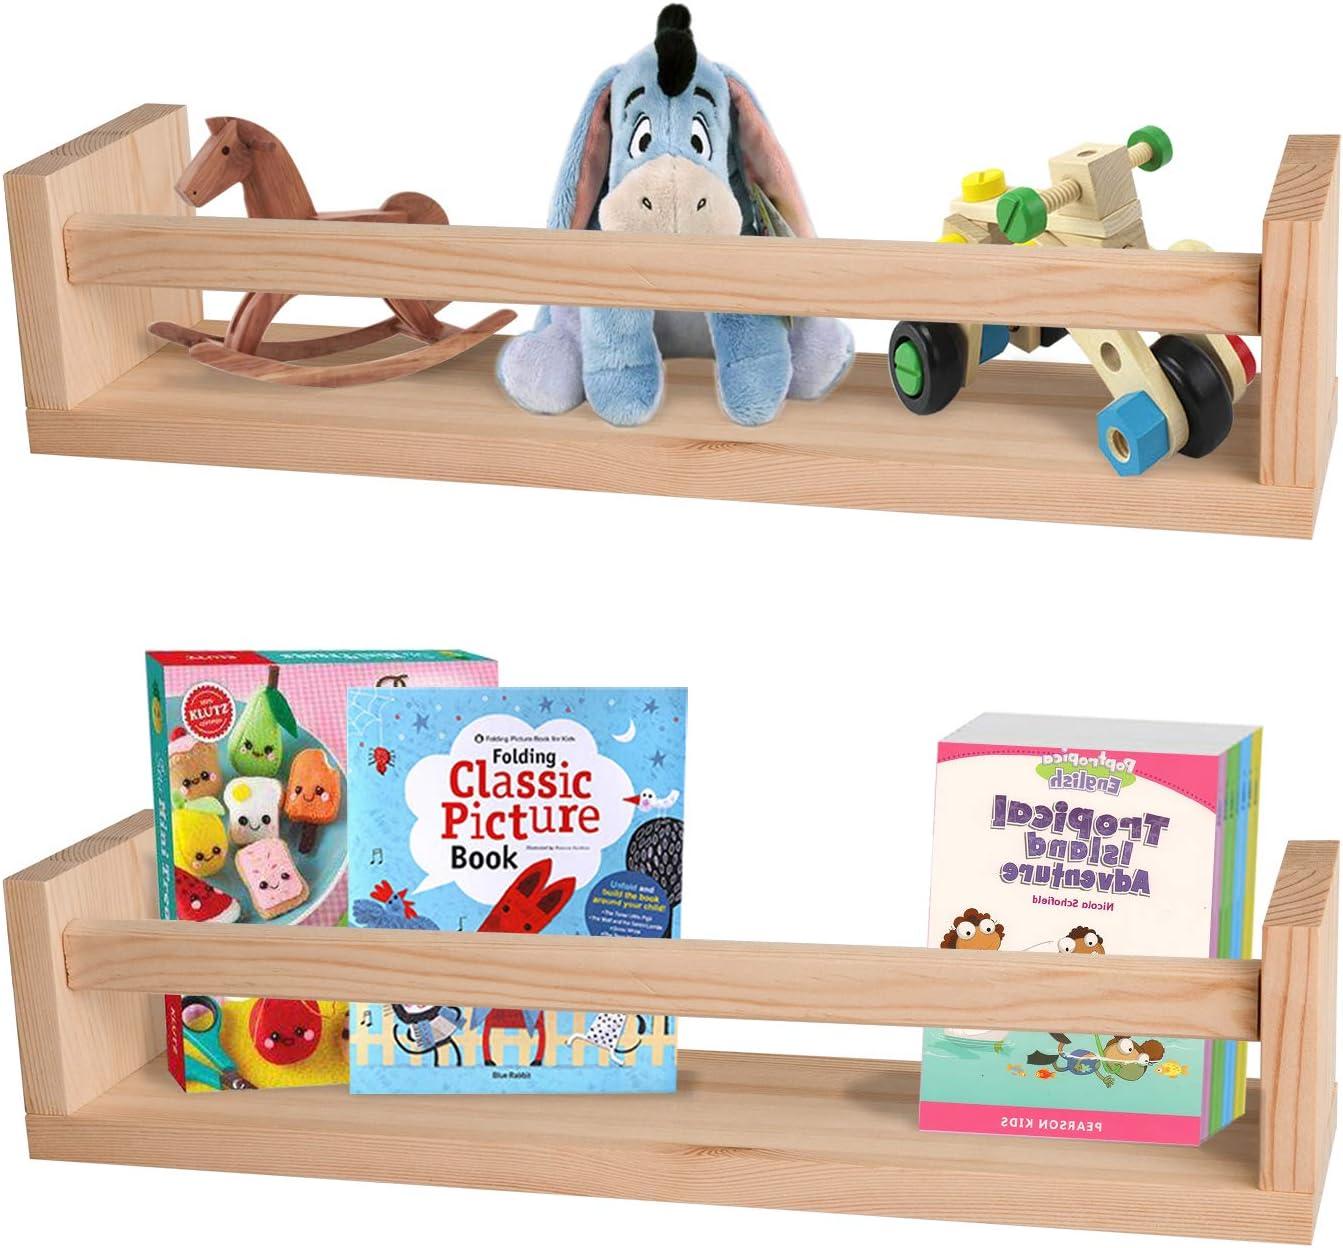 Nursery Shelves,Set of 2 Natural Wood Floating Wall Bookshelves for Kids,Nursery Book Shelves for Wall,Bathroom Decor, Kitchen Spice Rack (Natural Wood)